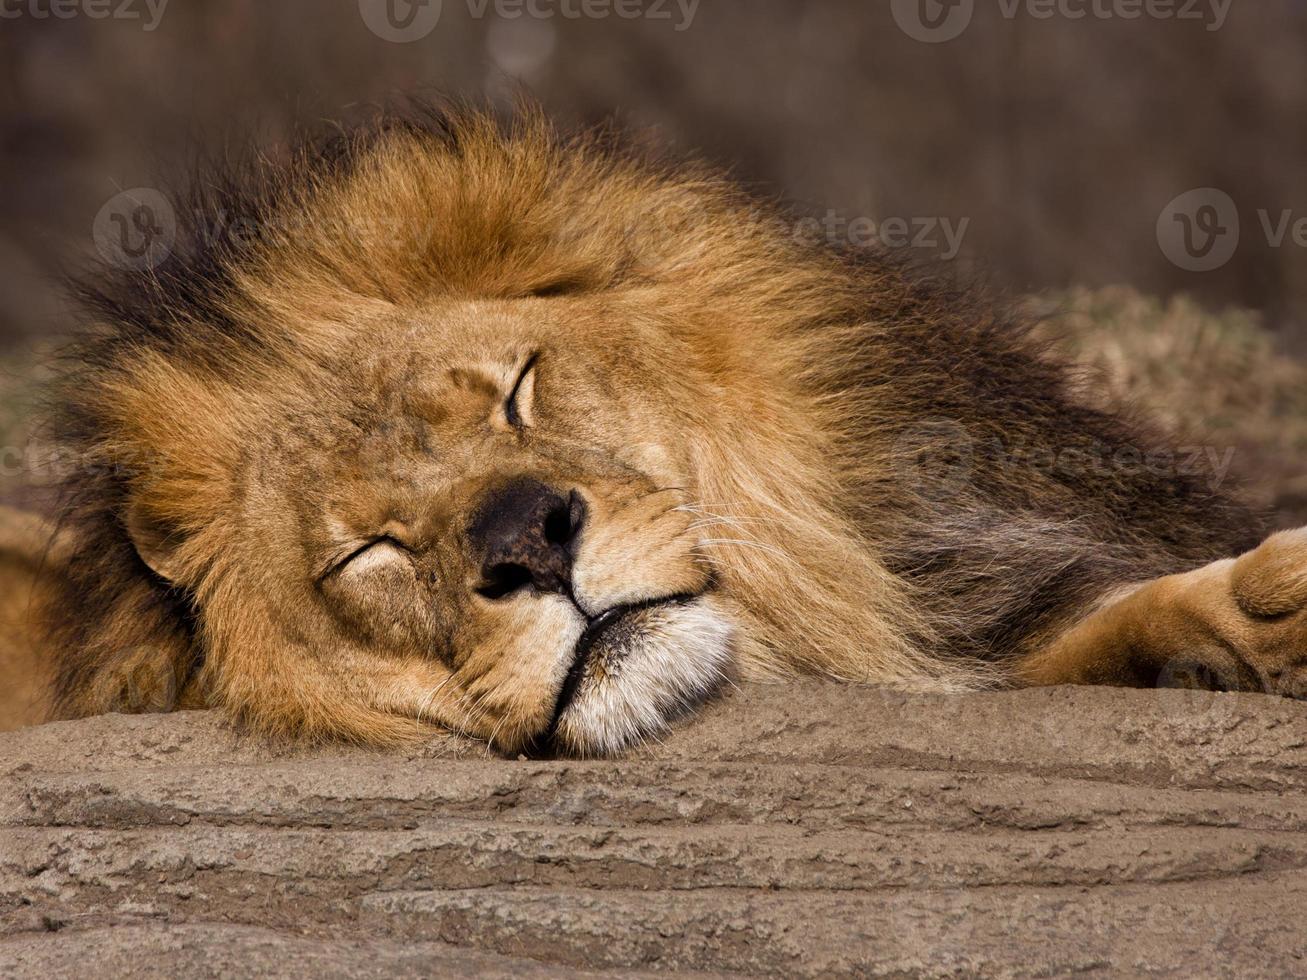 Sleeping Lion photo